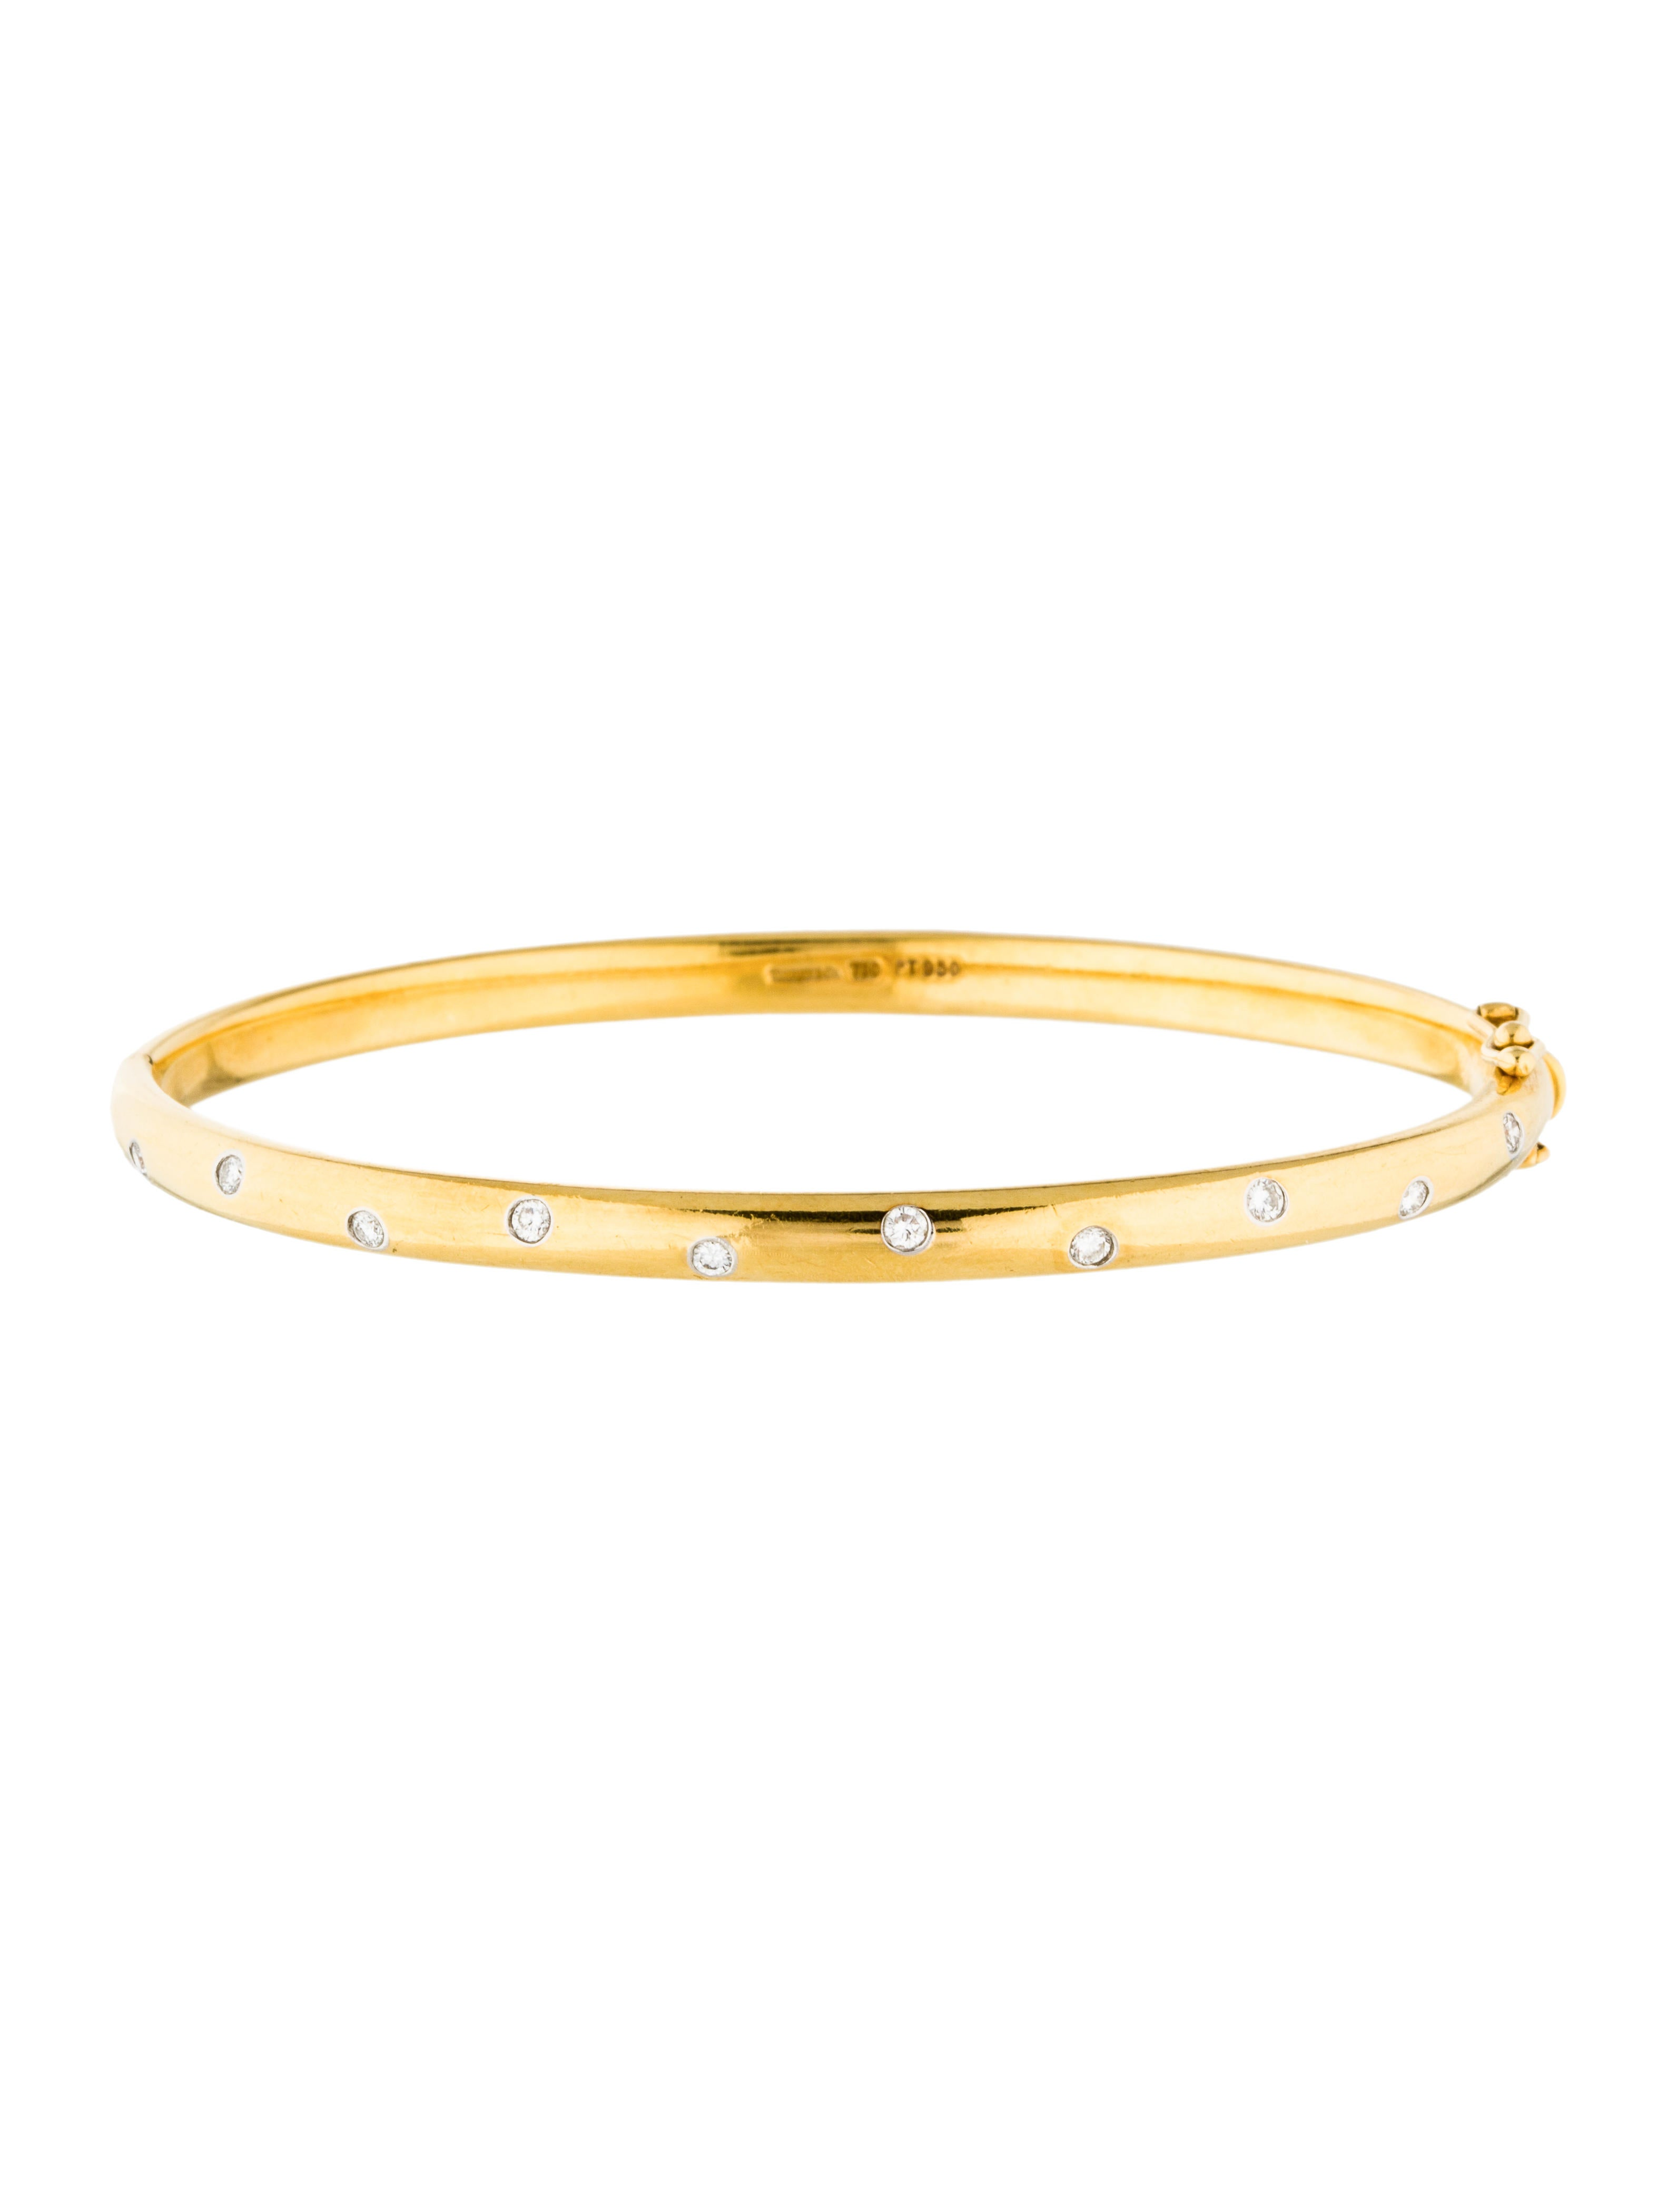 tiffany co diamond etoile bangle bracelets tif54671. Black Bedroom Furniture Sets. Home Design Ideas